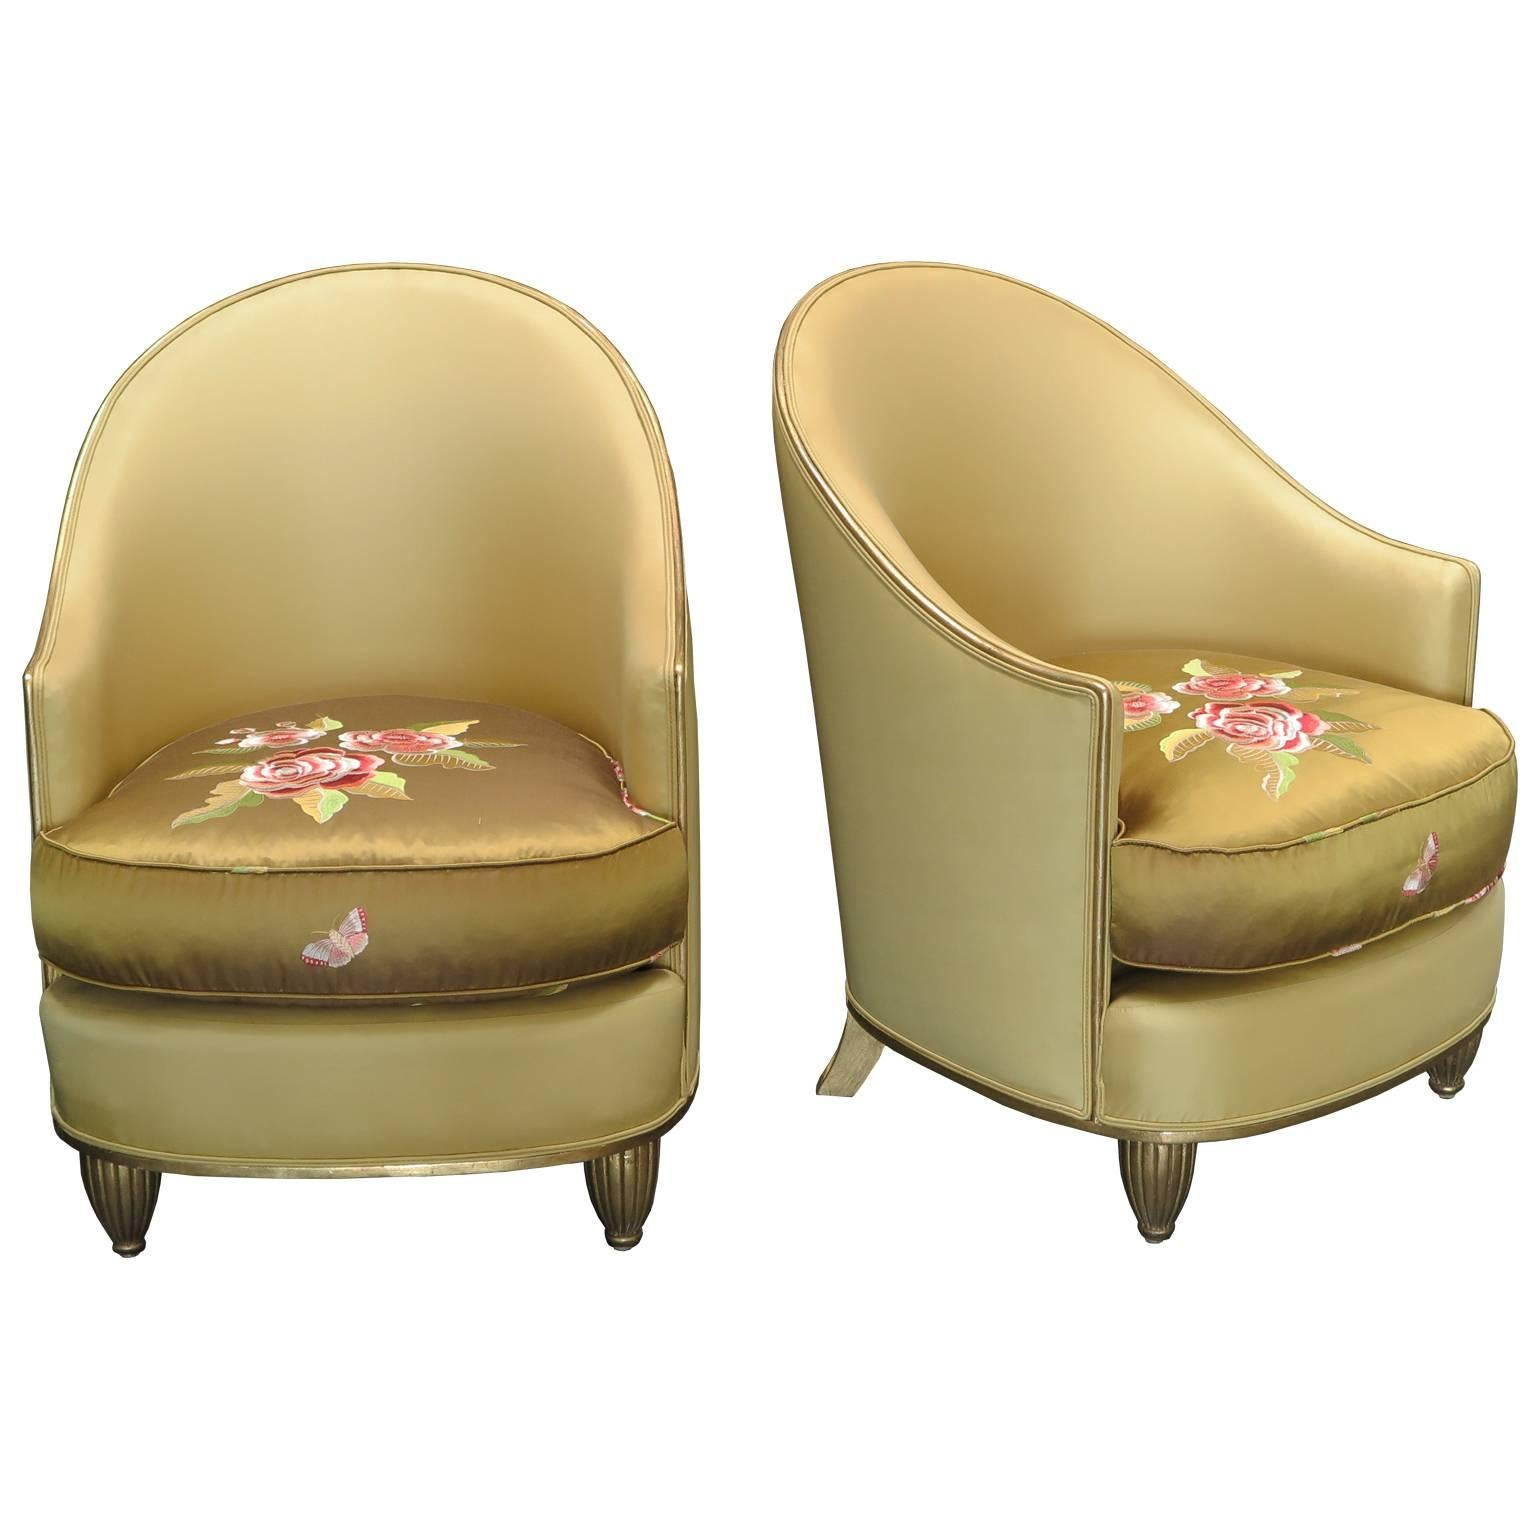 Pair of Art Deco Silk Lounge Chairs, France, circa 1920s